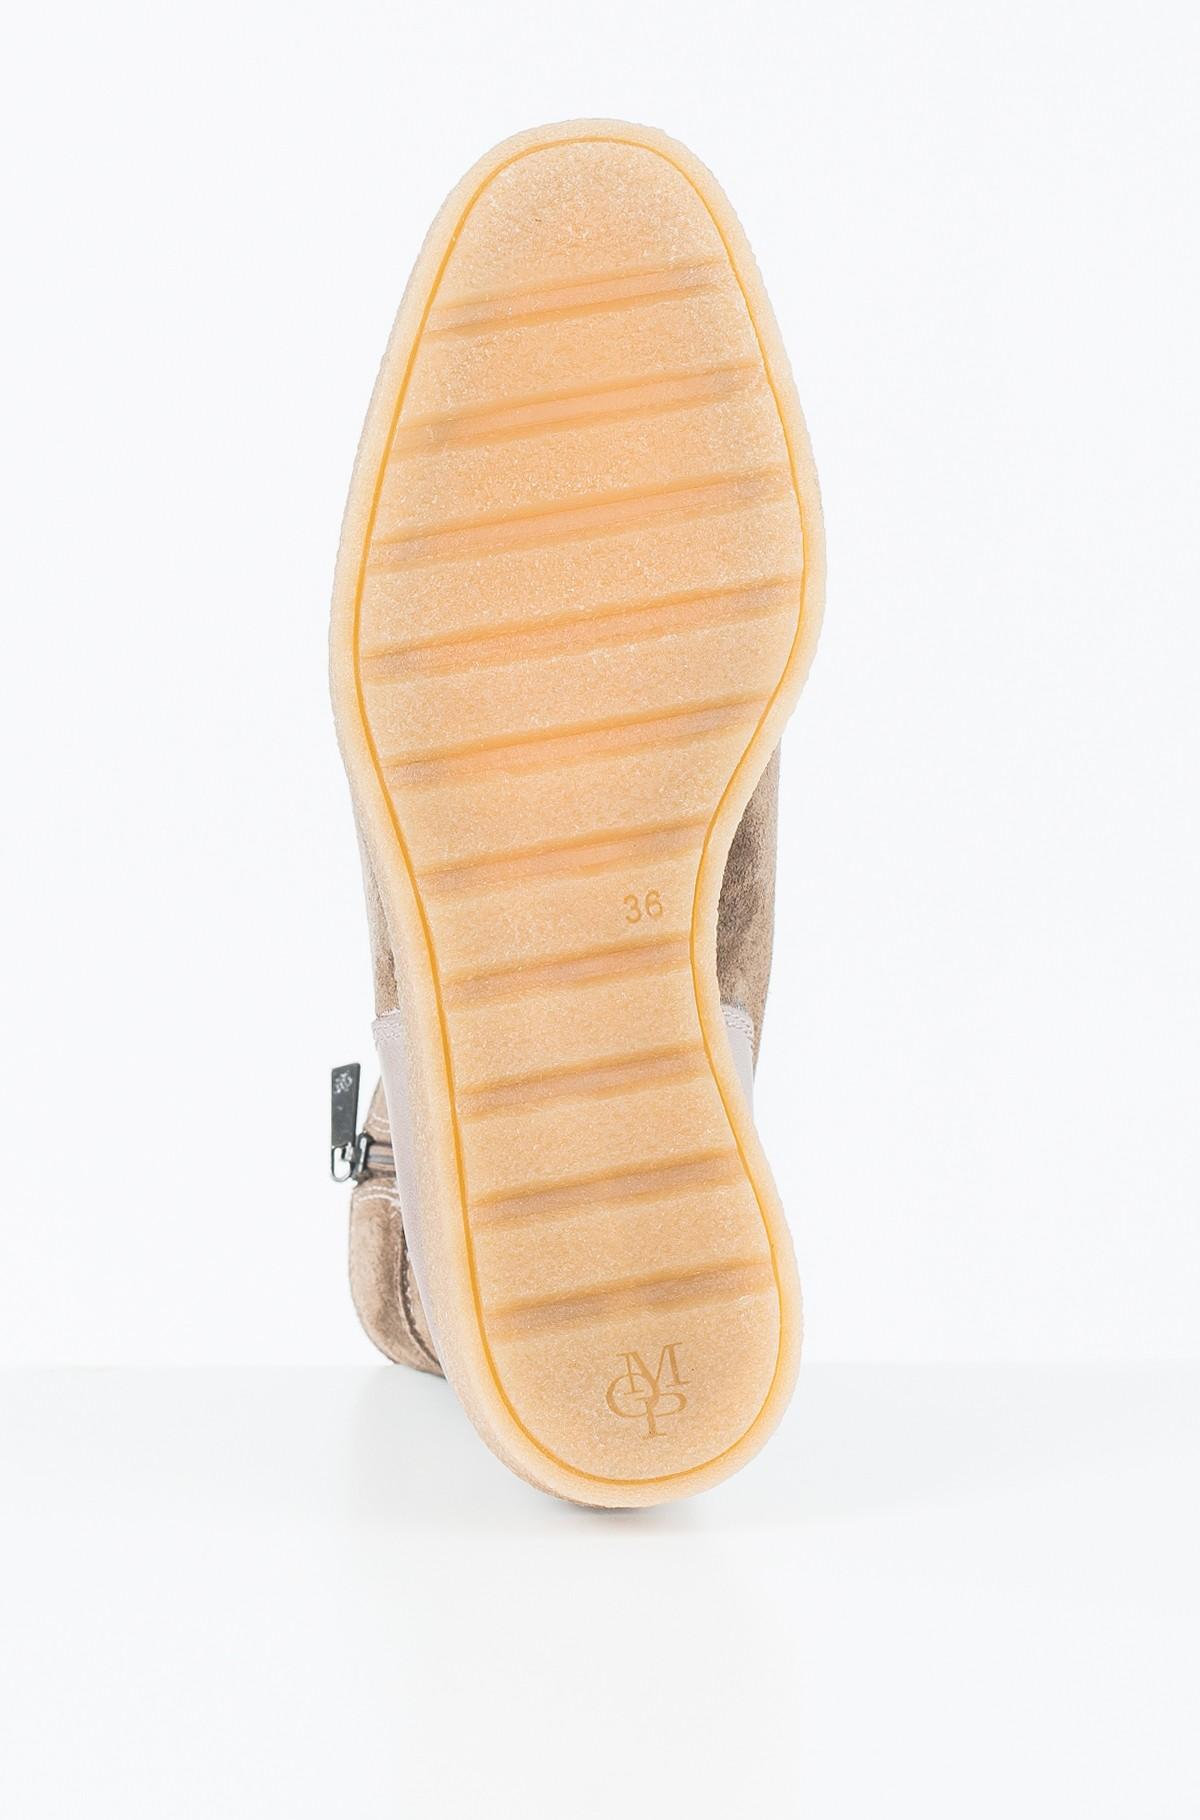 Boots 709 14296001 304-full-3